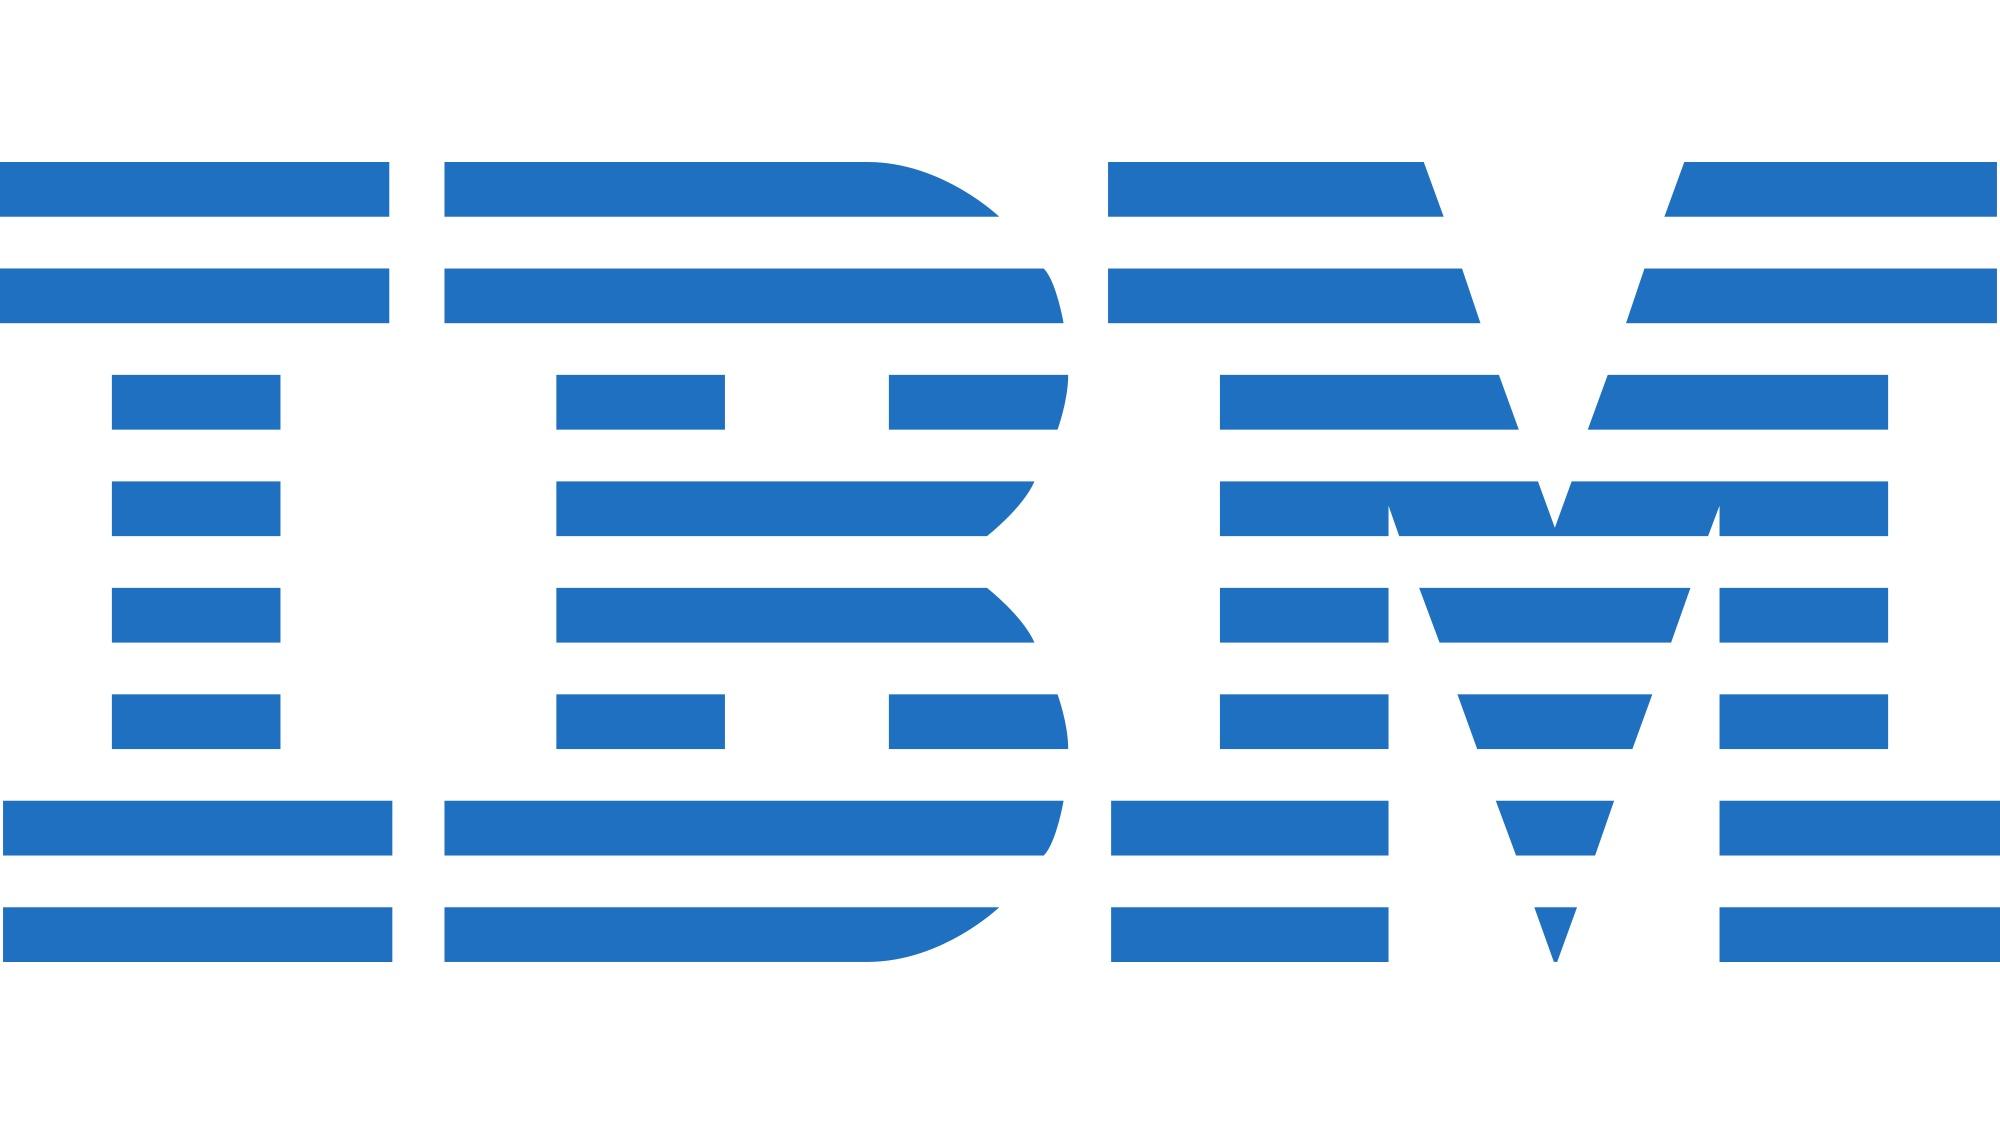 IBM Logo 16:9 hires PNG